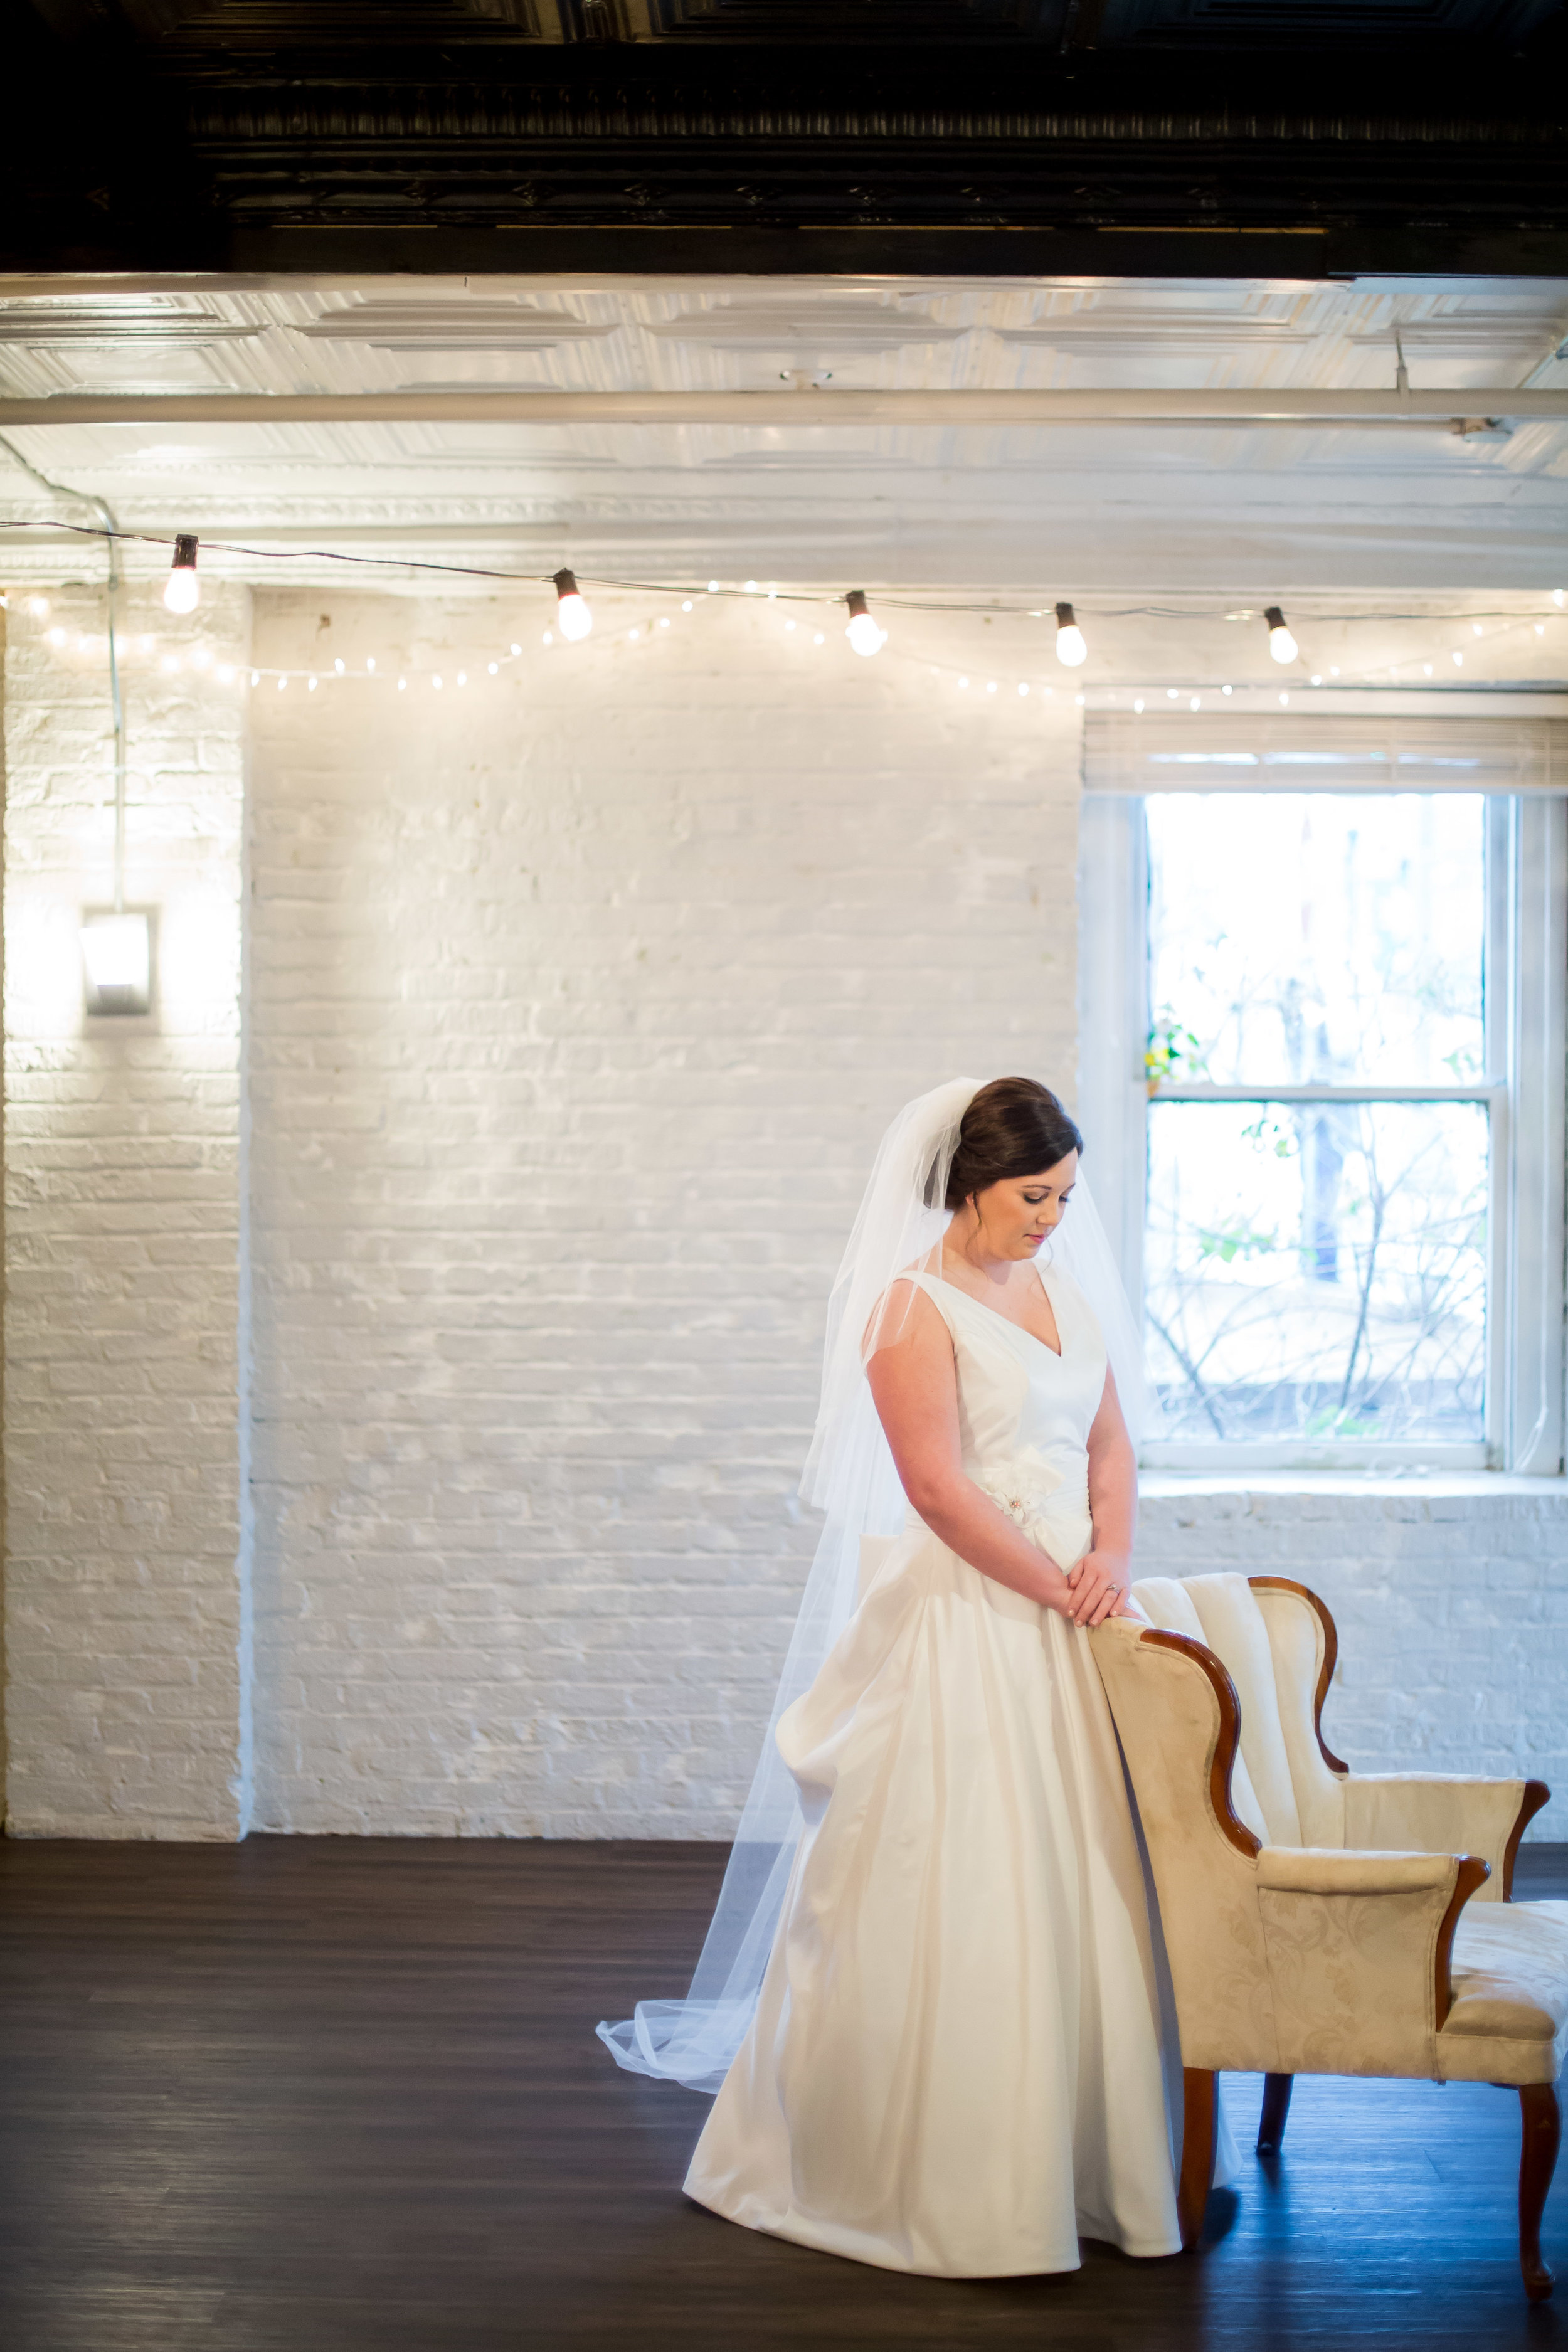 bridal (23 of 23).jpg